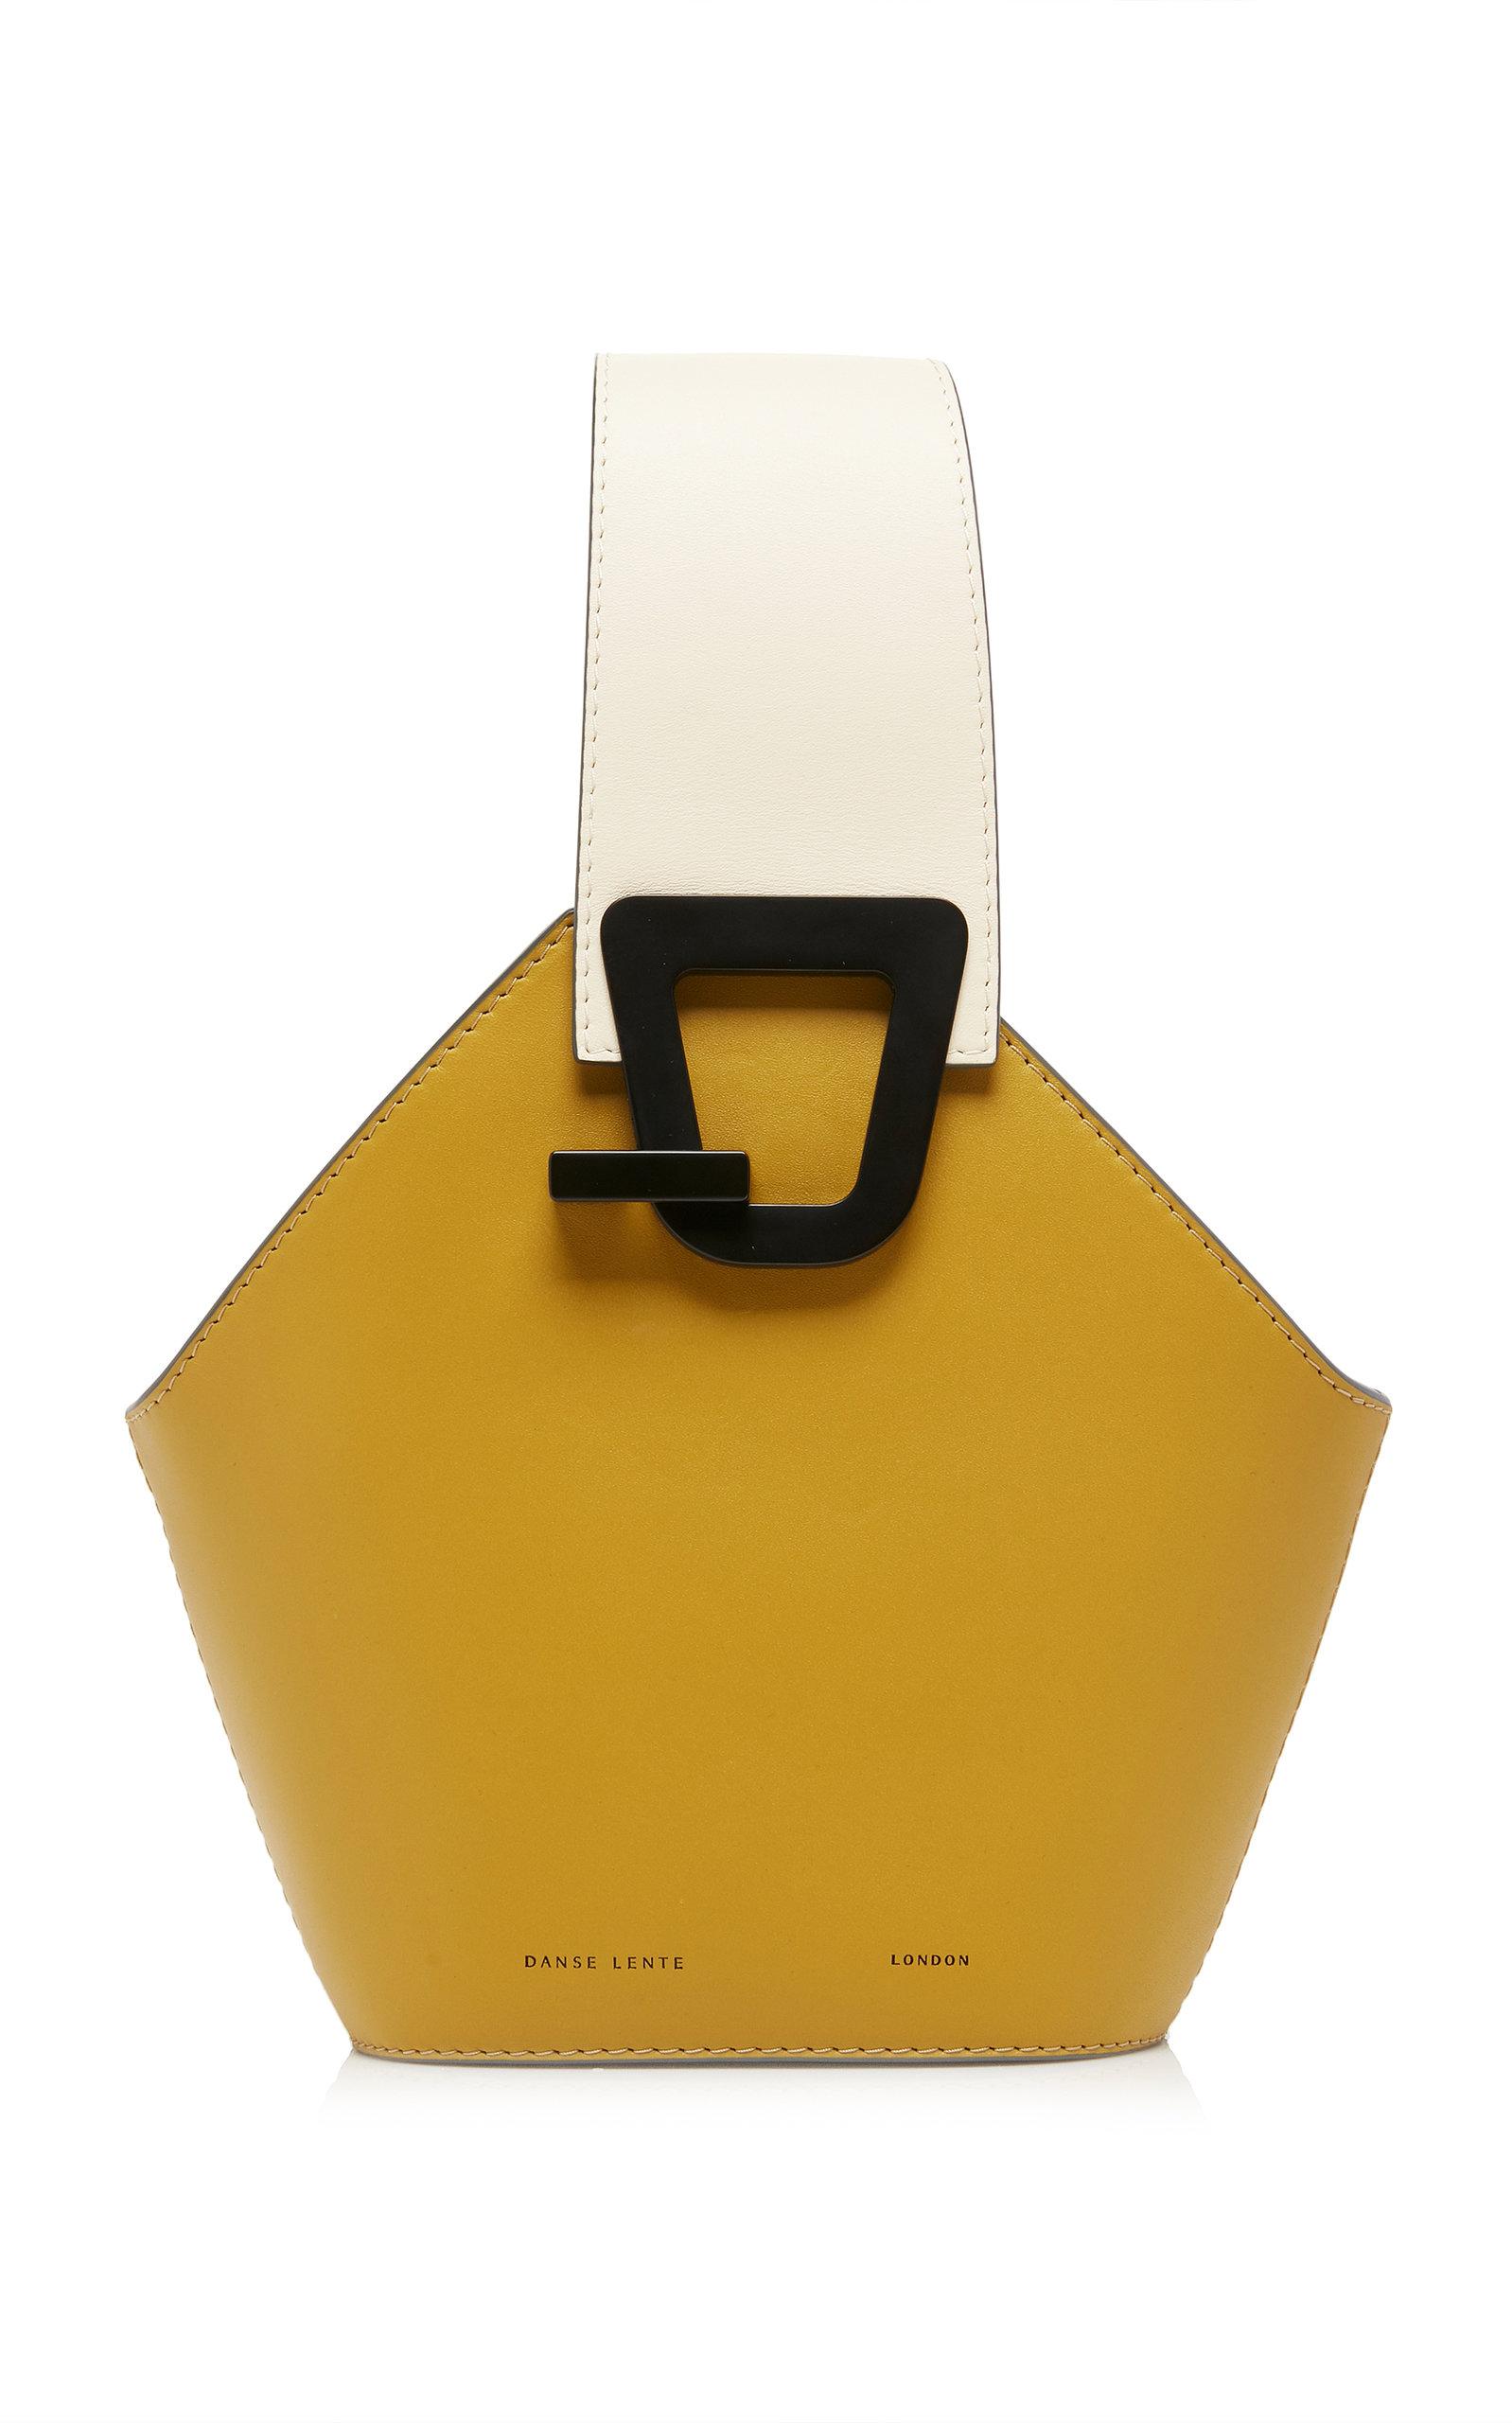 e45c0deb47c9 Danse LenteJohnny Leather Mini Bag. CLOSE. Loading. Loading. Loading